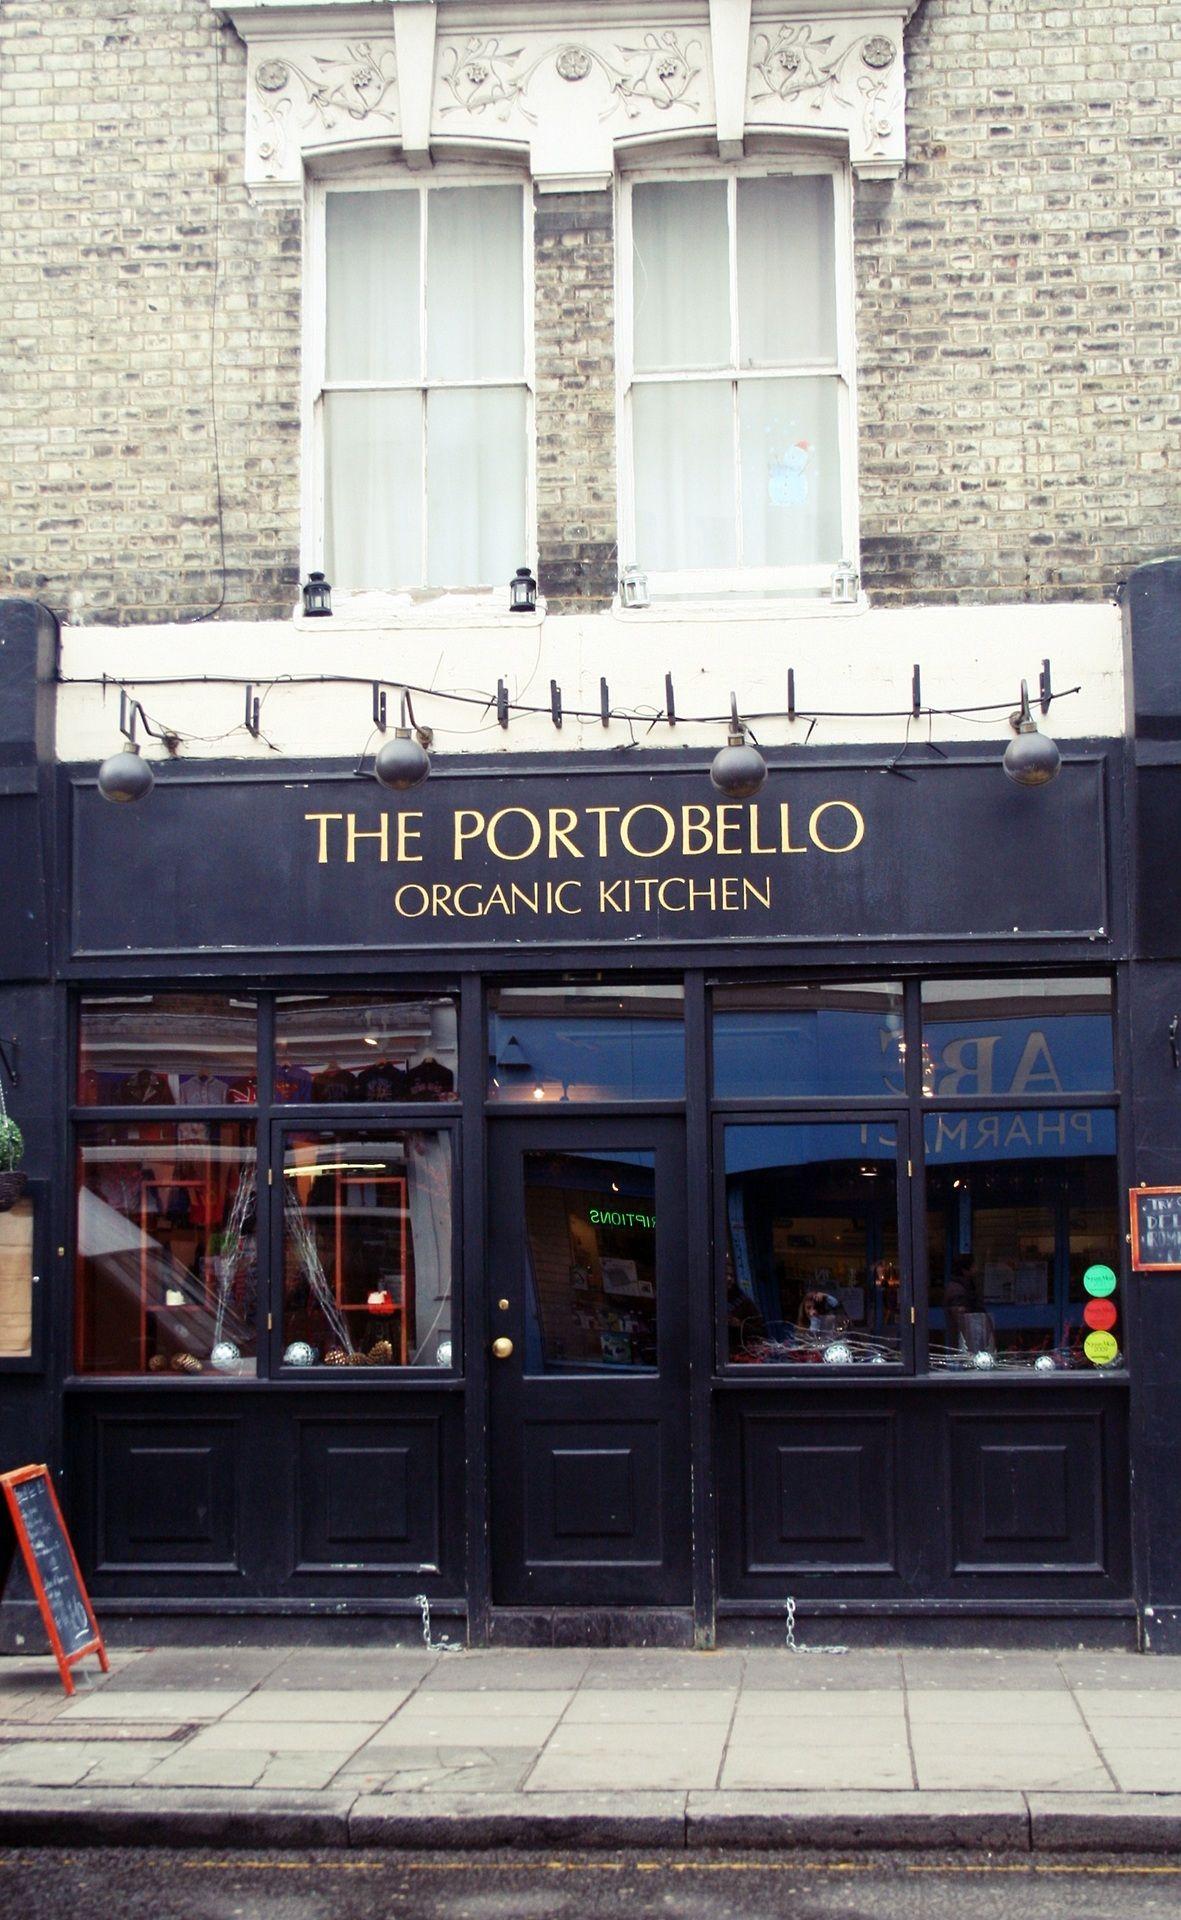 Portobello Organic Kitchen Portobello road notting hill london uk and ireland pinterest the portobello organic restaurant london england workwithnaturefo